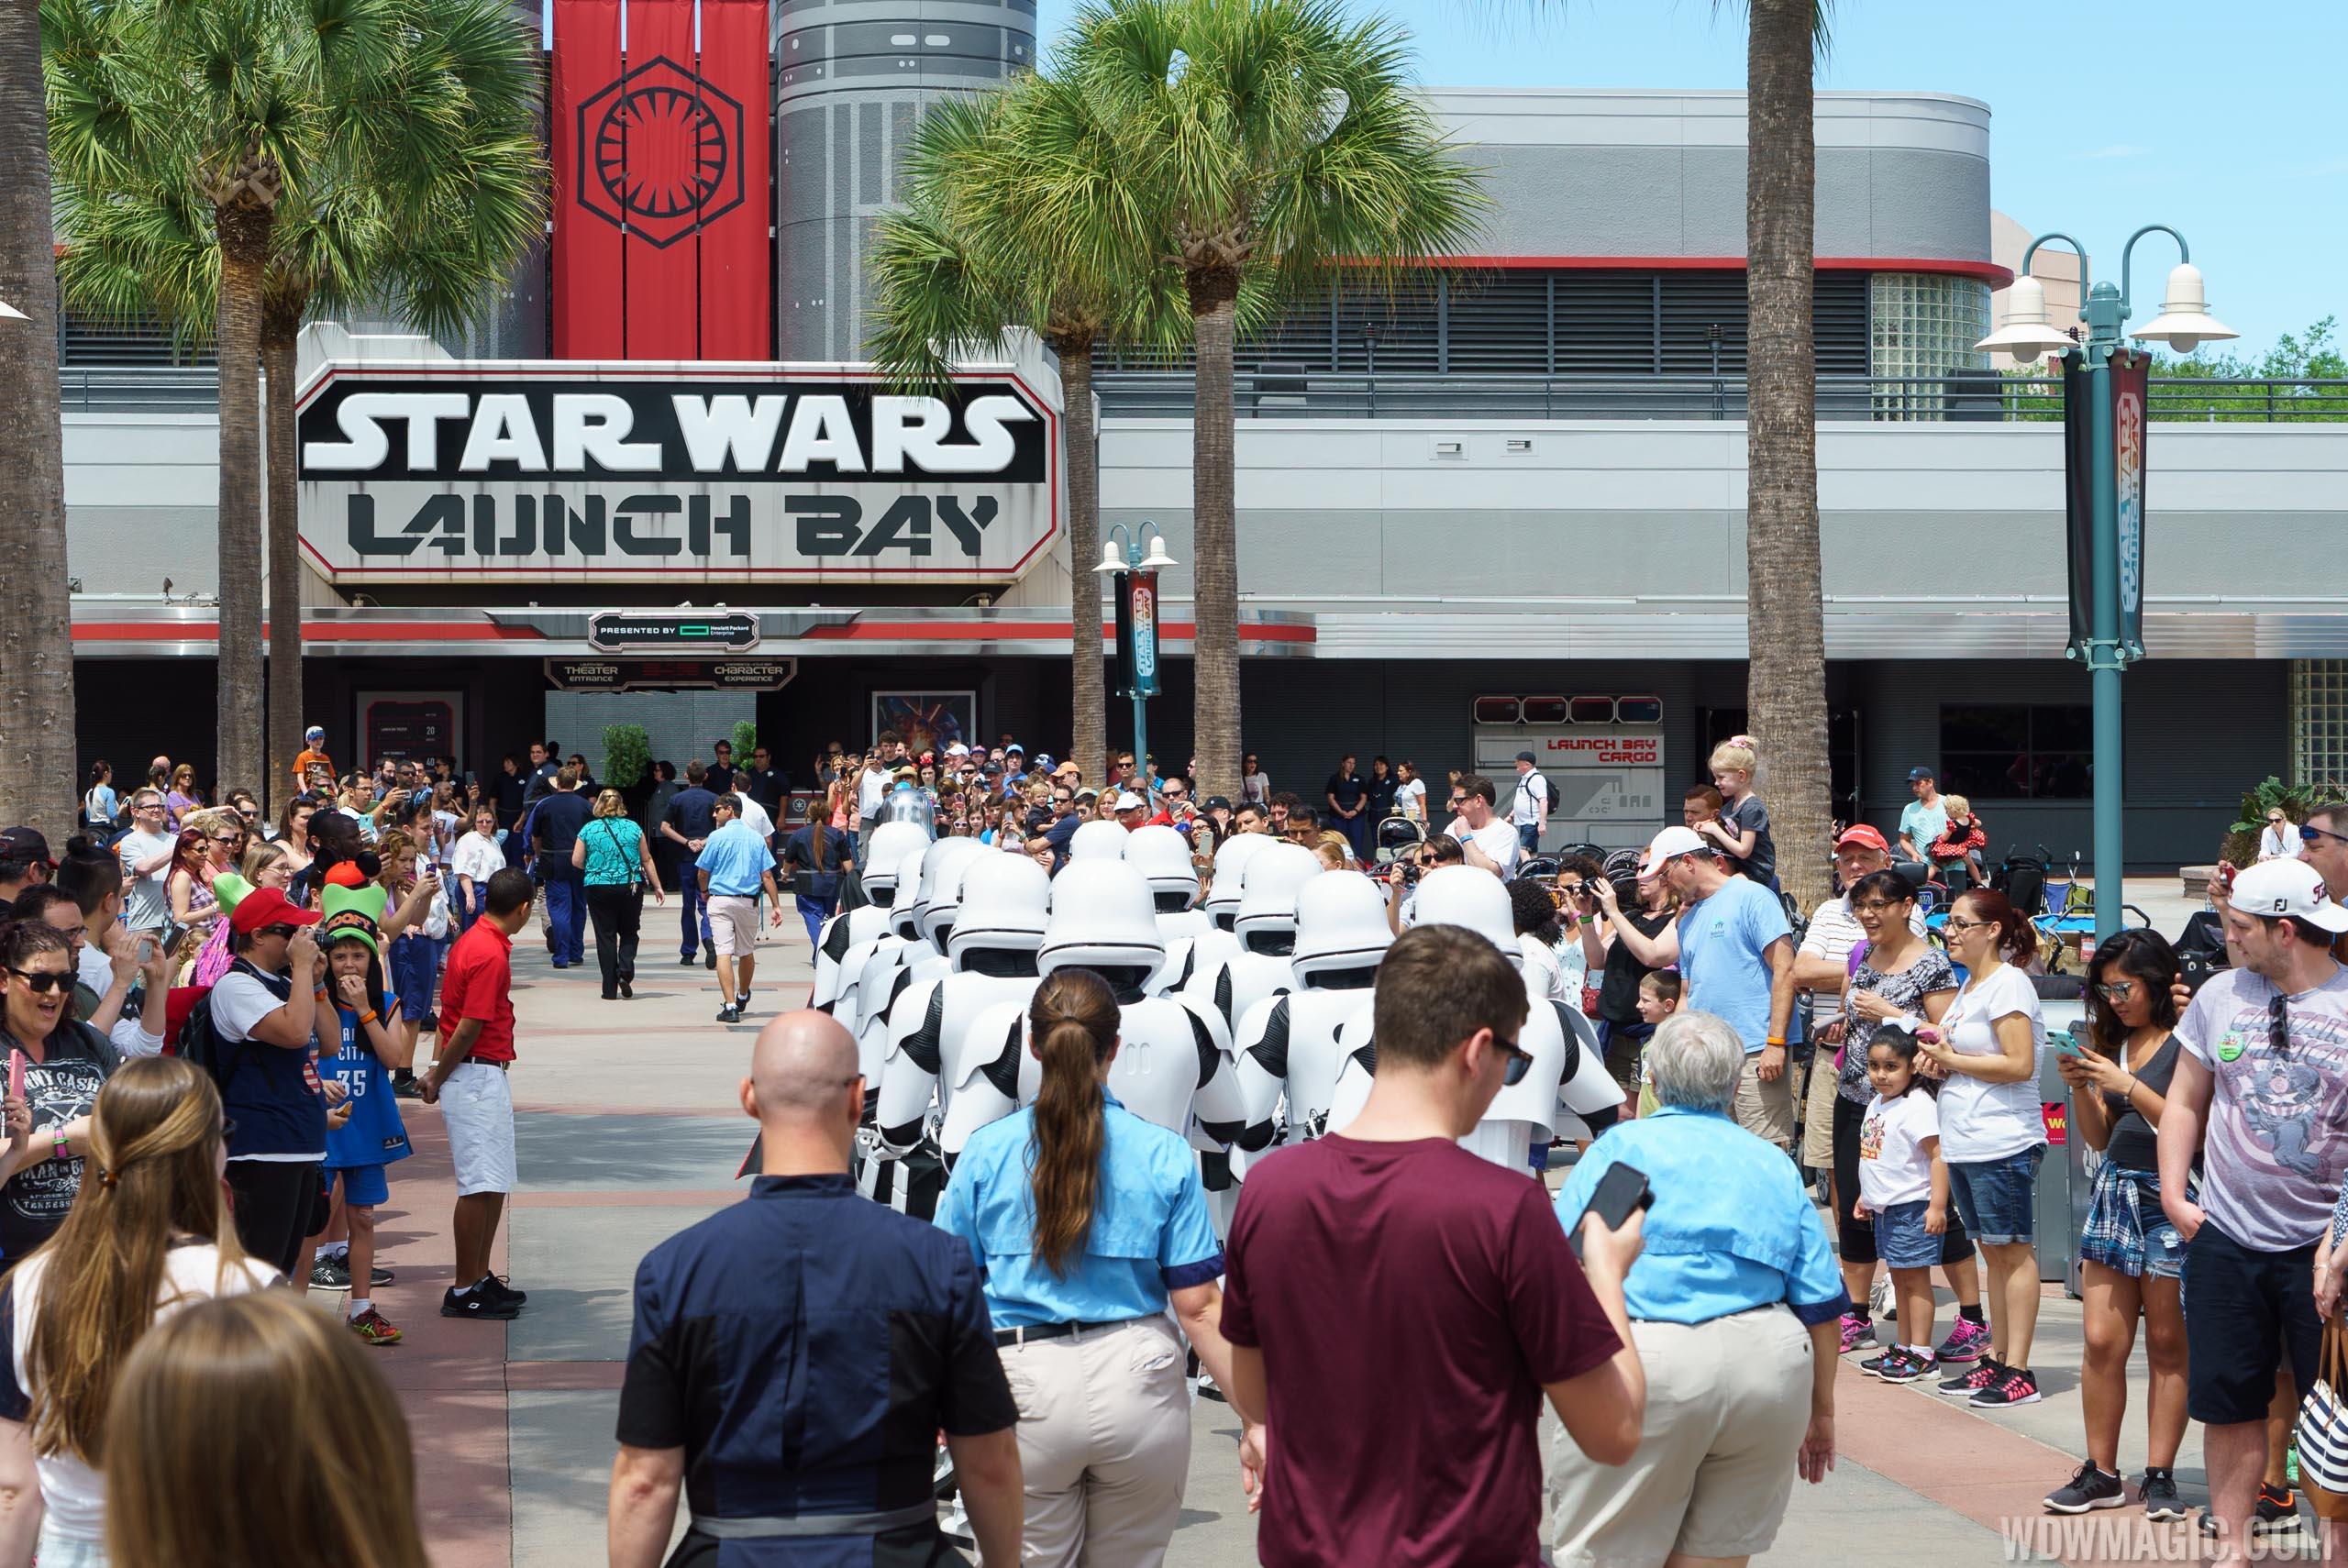 Star Wars Captain Phasma Stormtrooper March